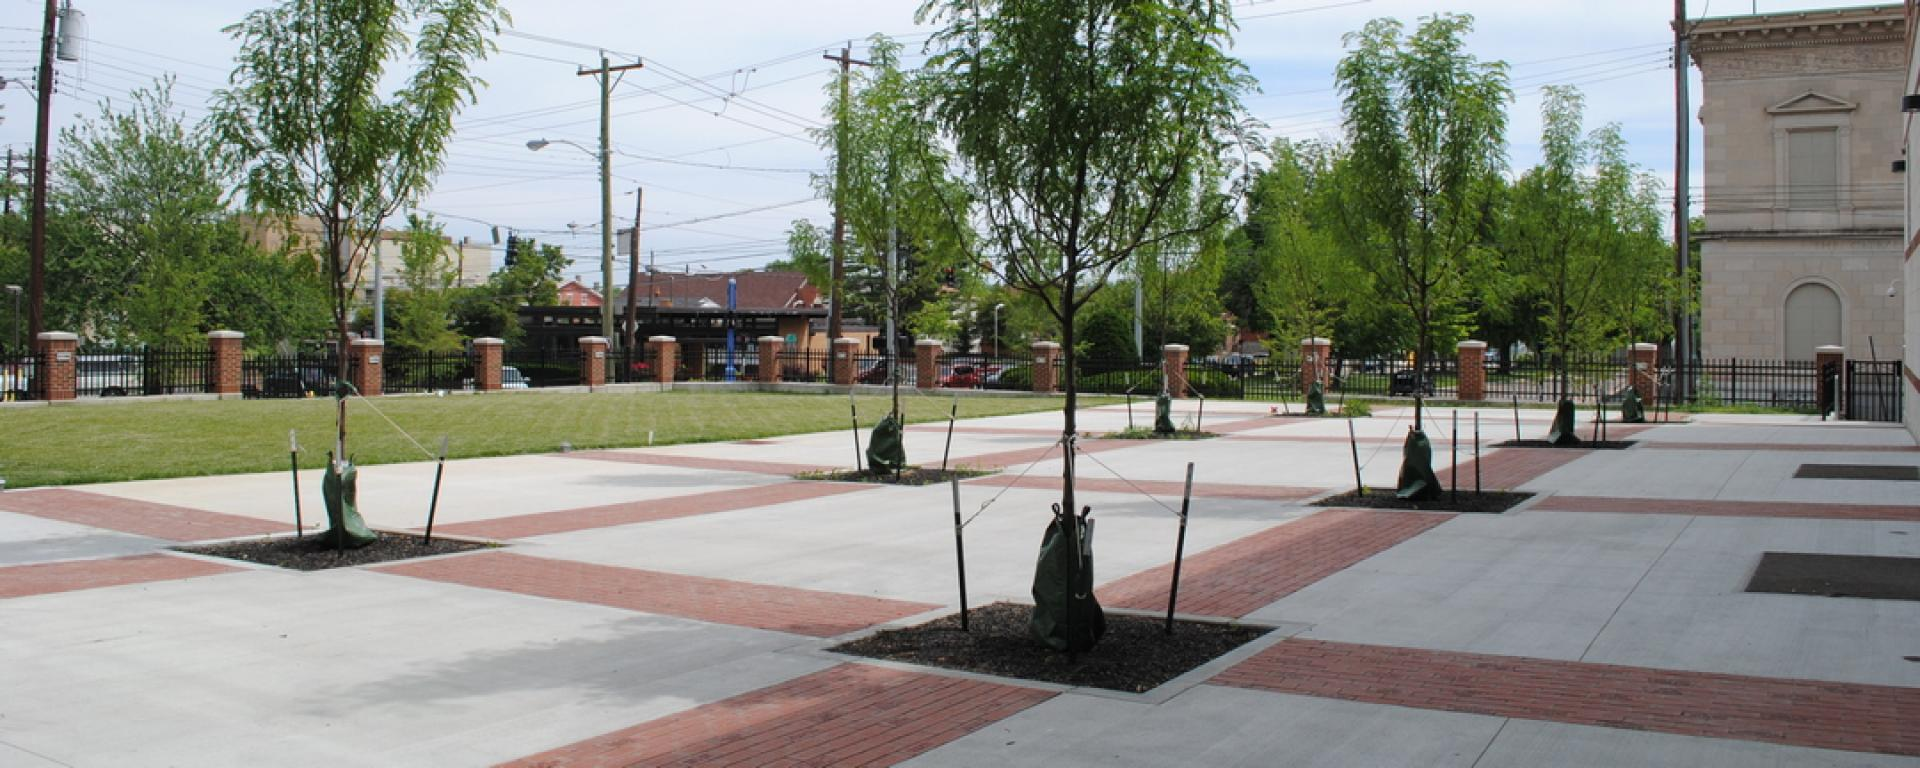 Courtyard view of Covington Latin School